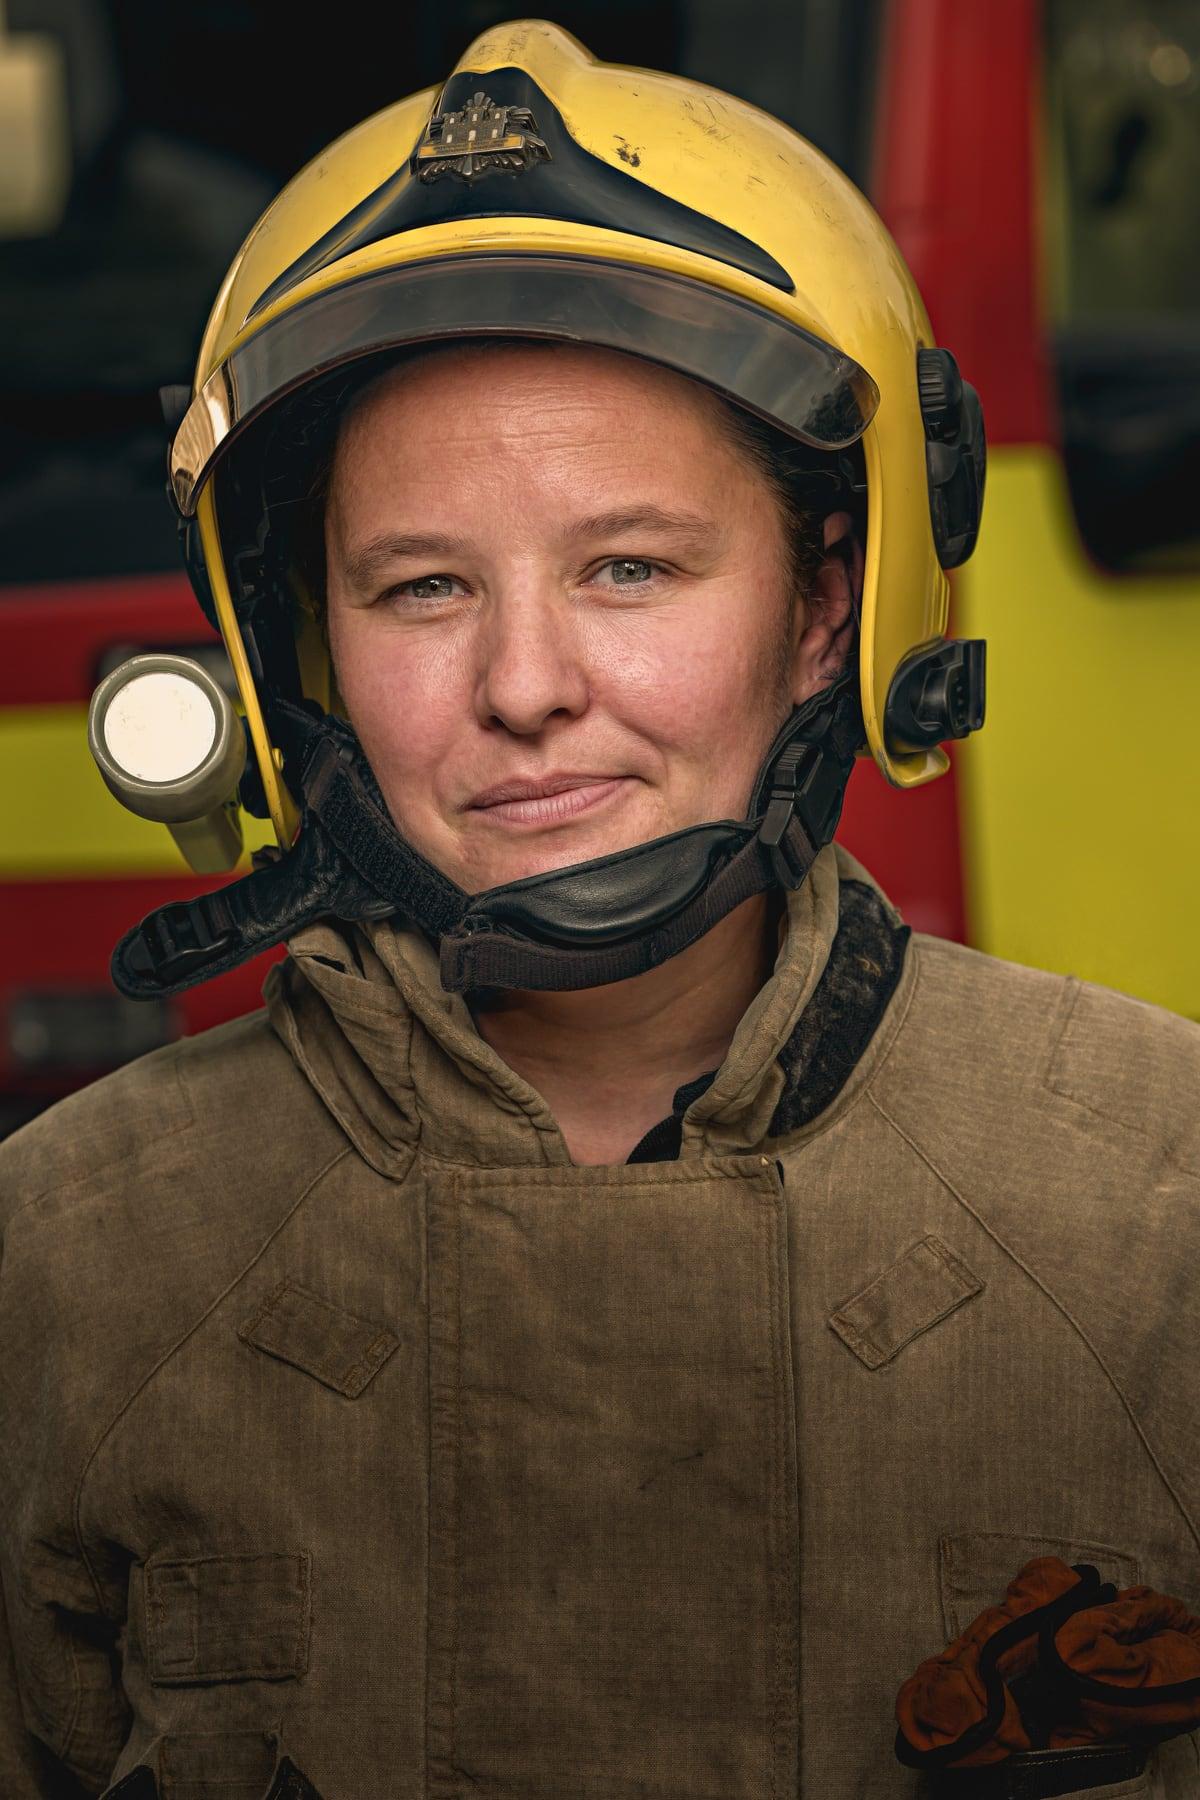 Firefighter Tania Robinson, Full time mum